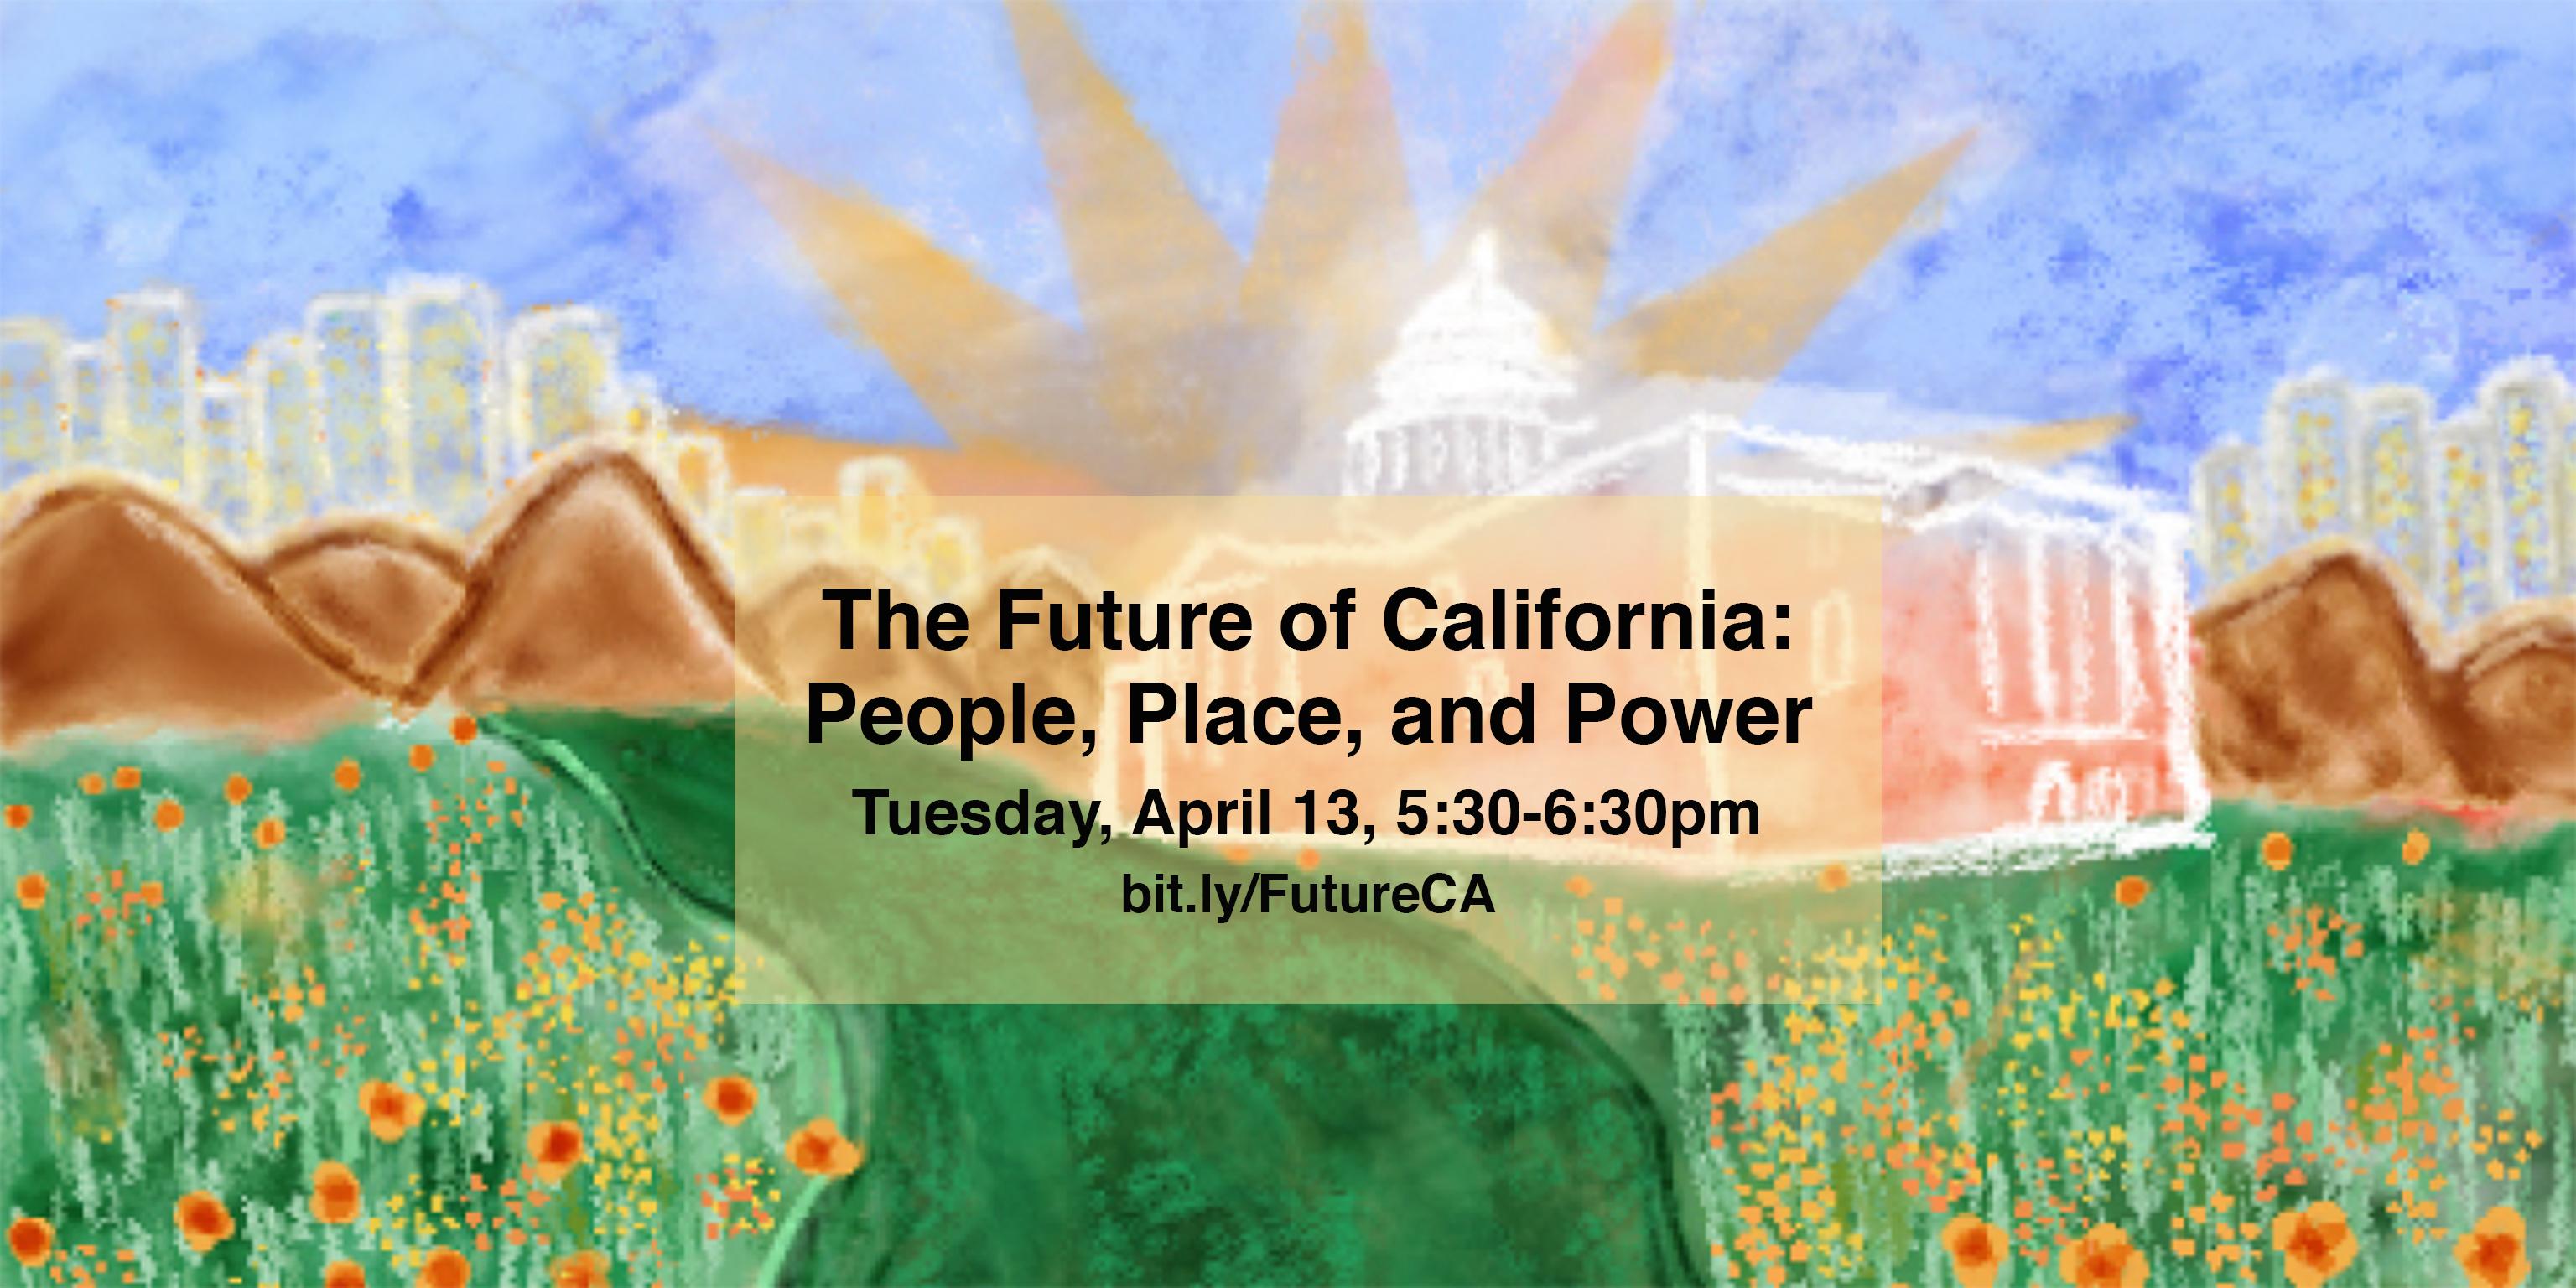 Future of California event image